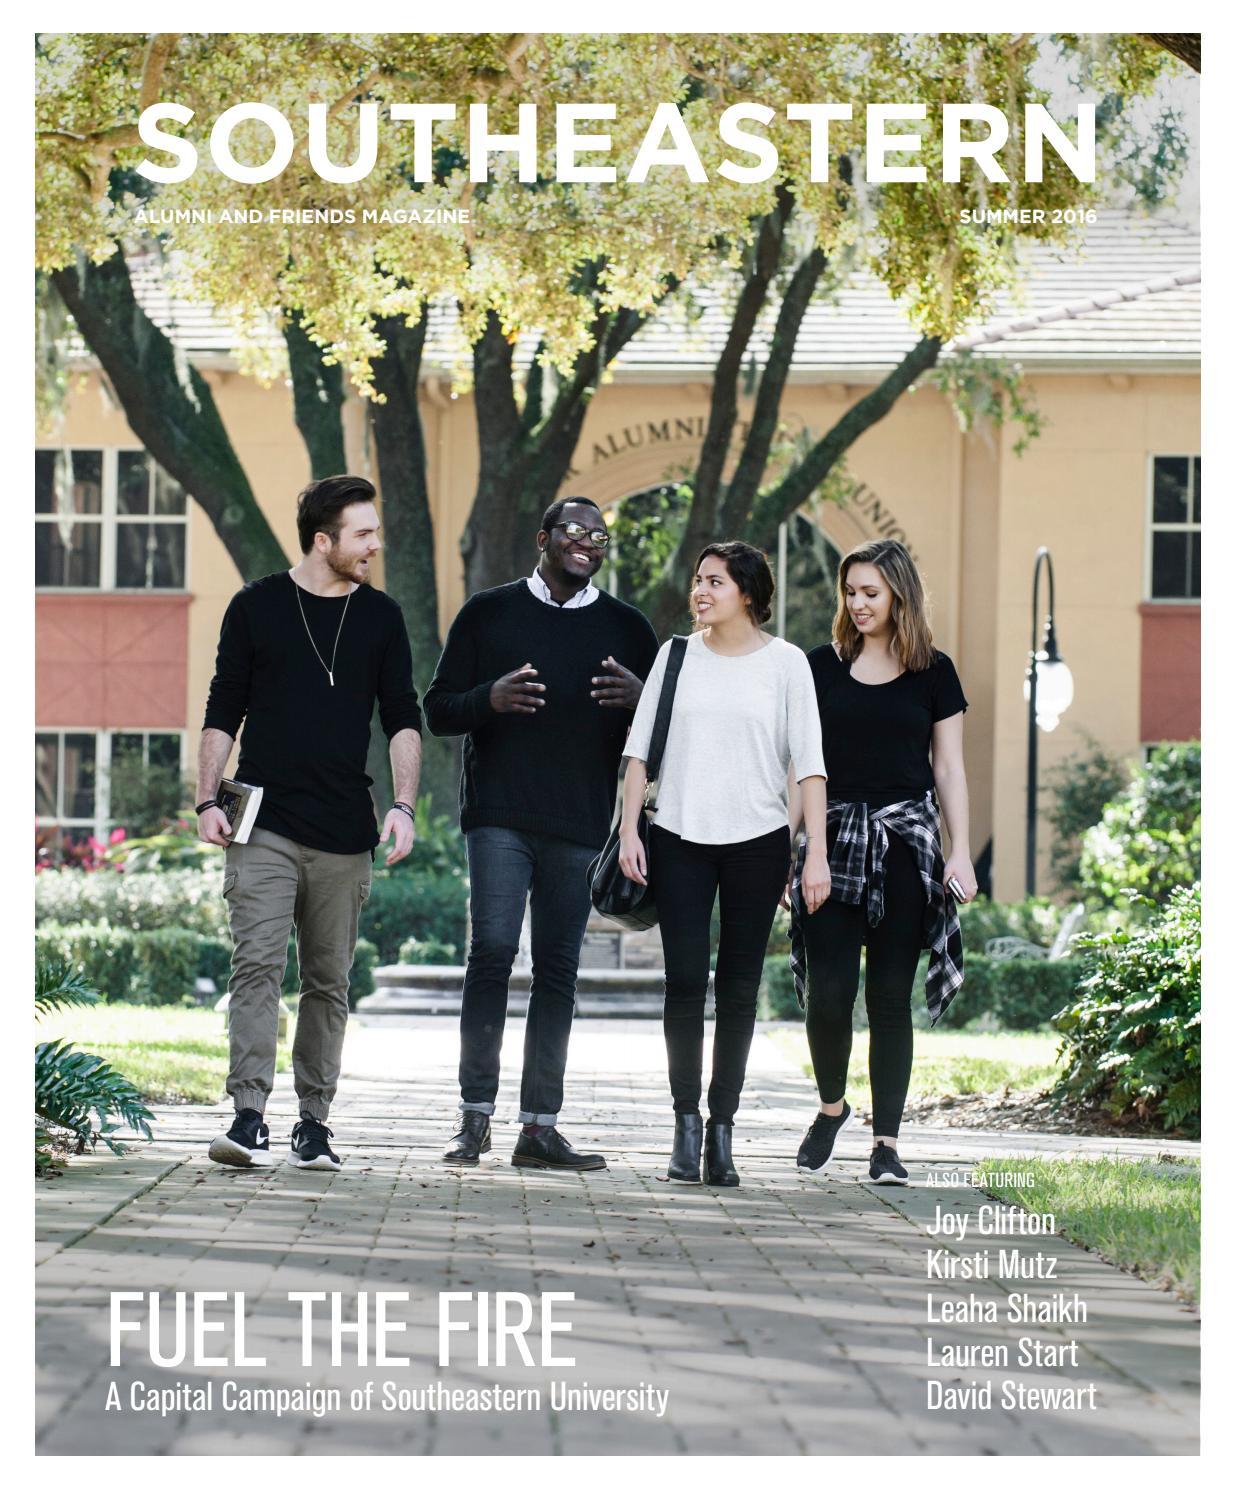 southeastern alumni magazine summer 2016 by southeastern southeastern alumni magazine summer 2016 by southeastern university issuu